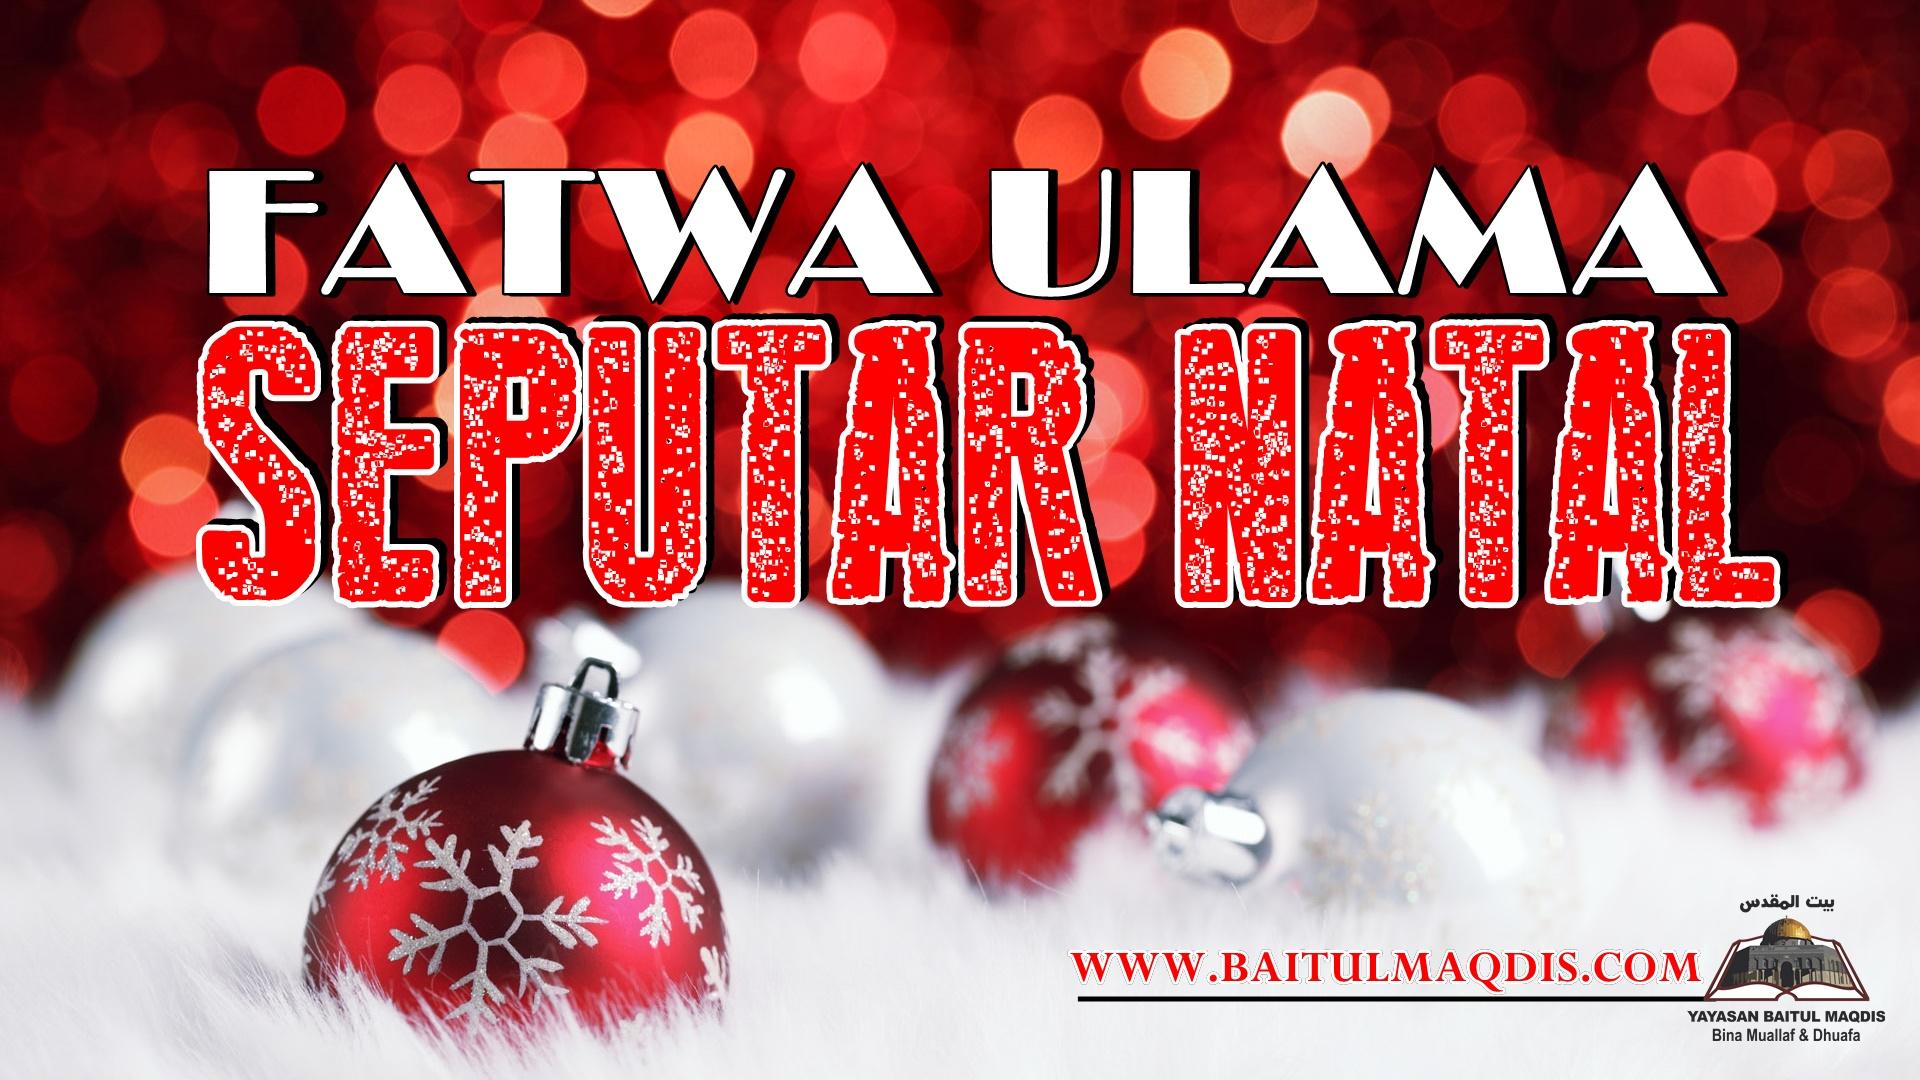 Fatwa Ulama Seputar Natal